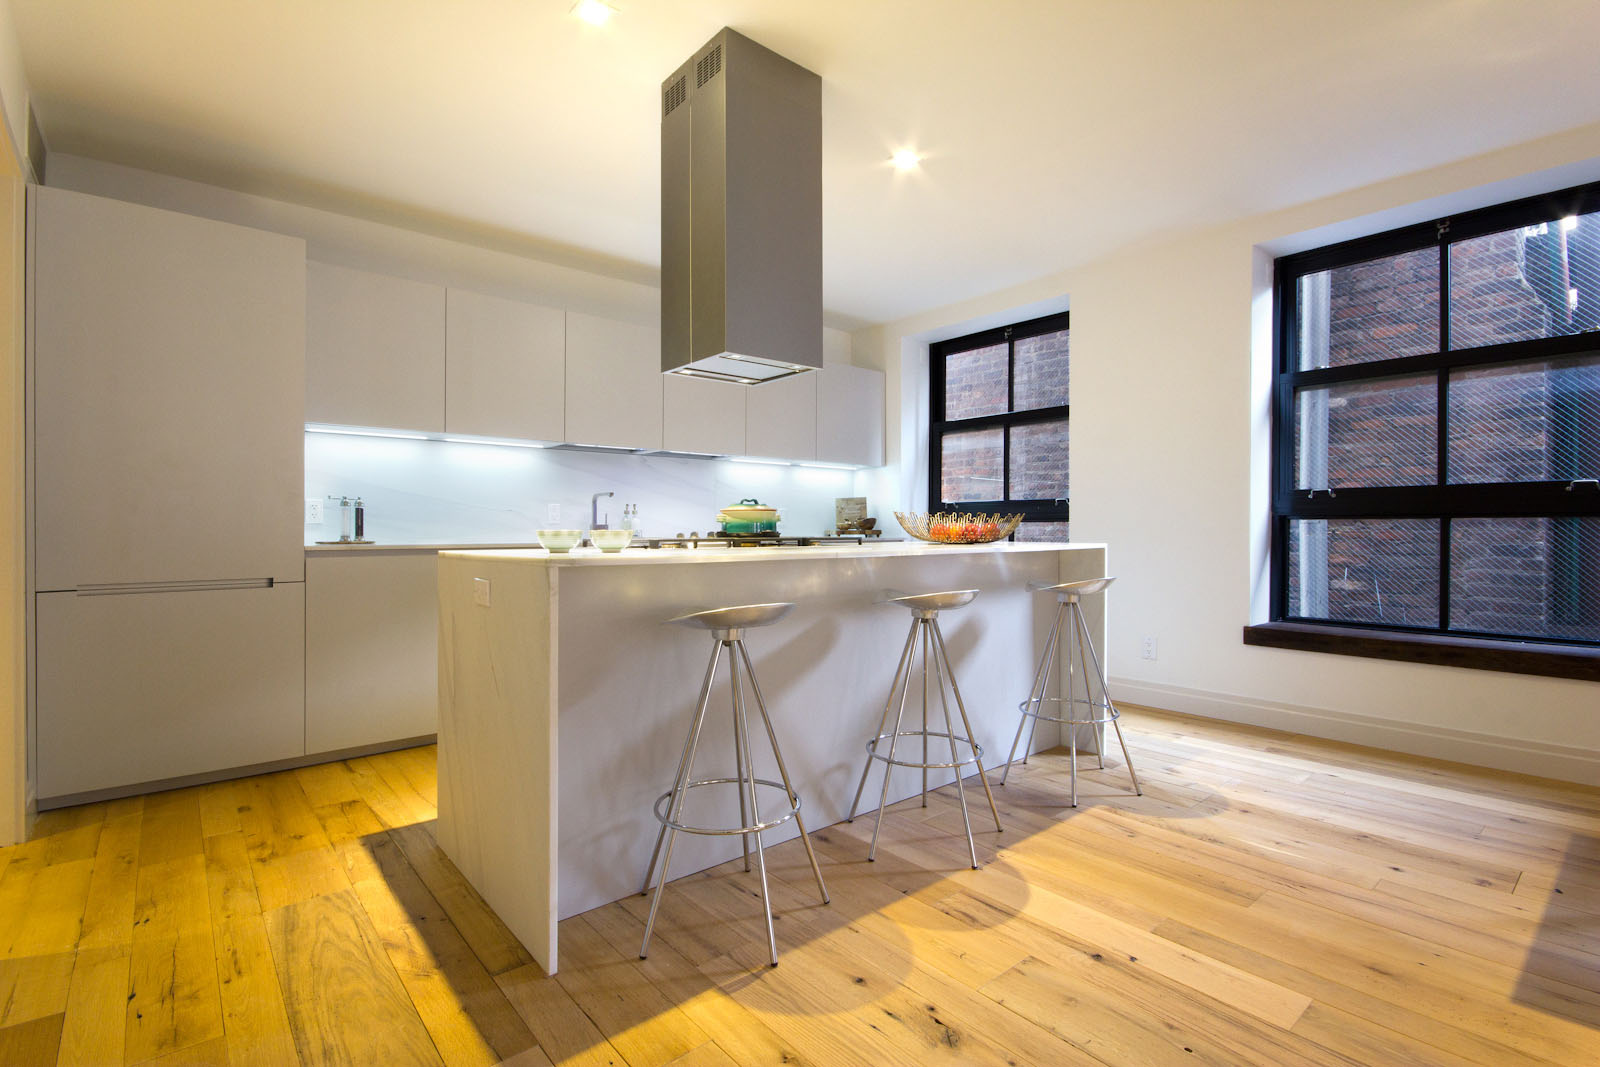 Inspirational Nolita Luxury Loft In New York IDesignArch Interior Design Architecture